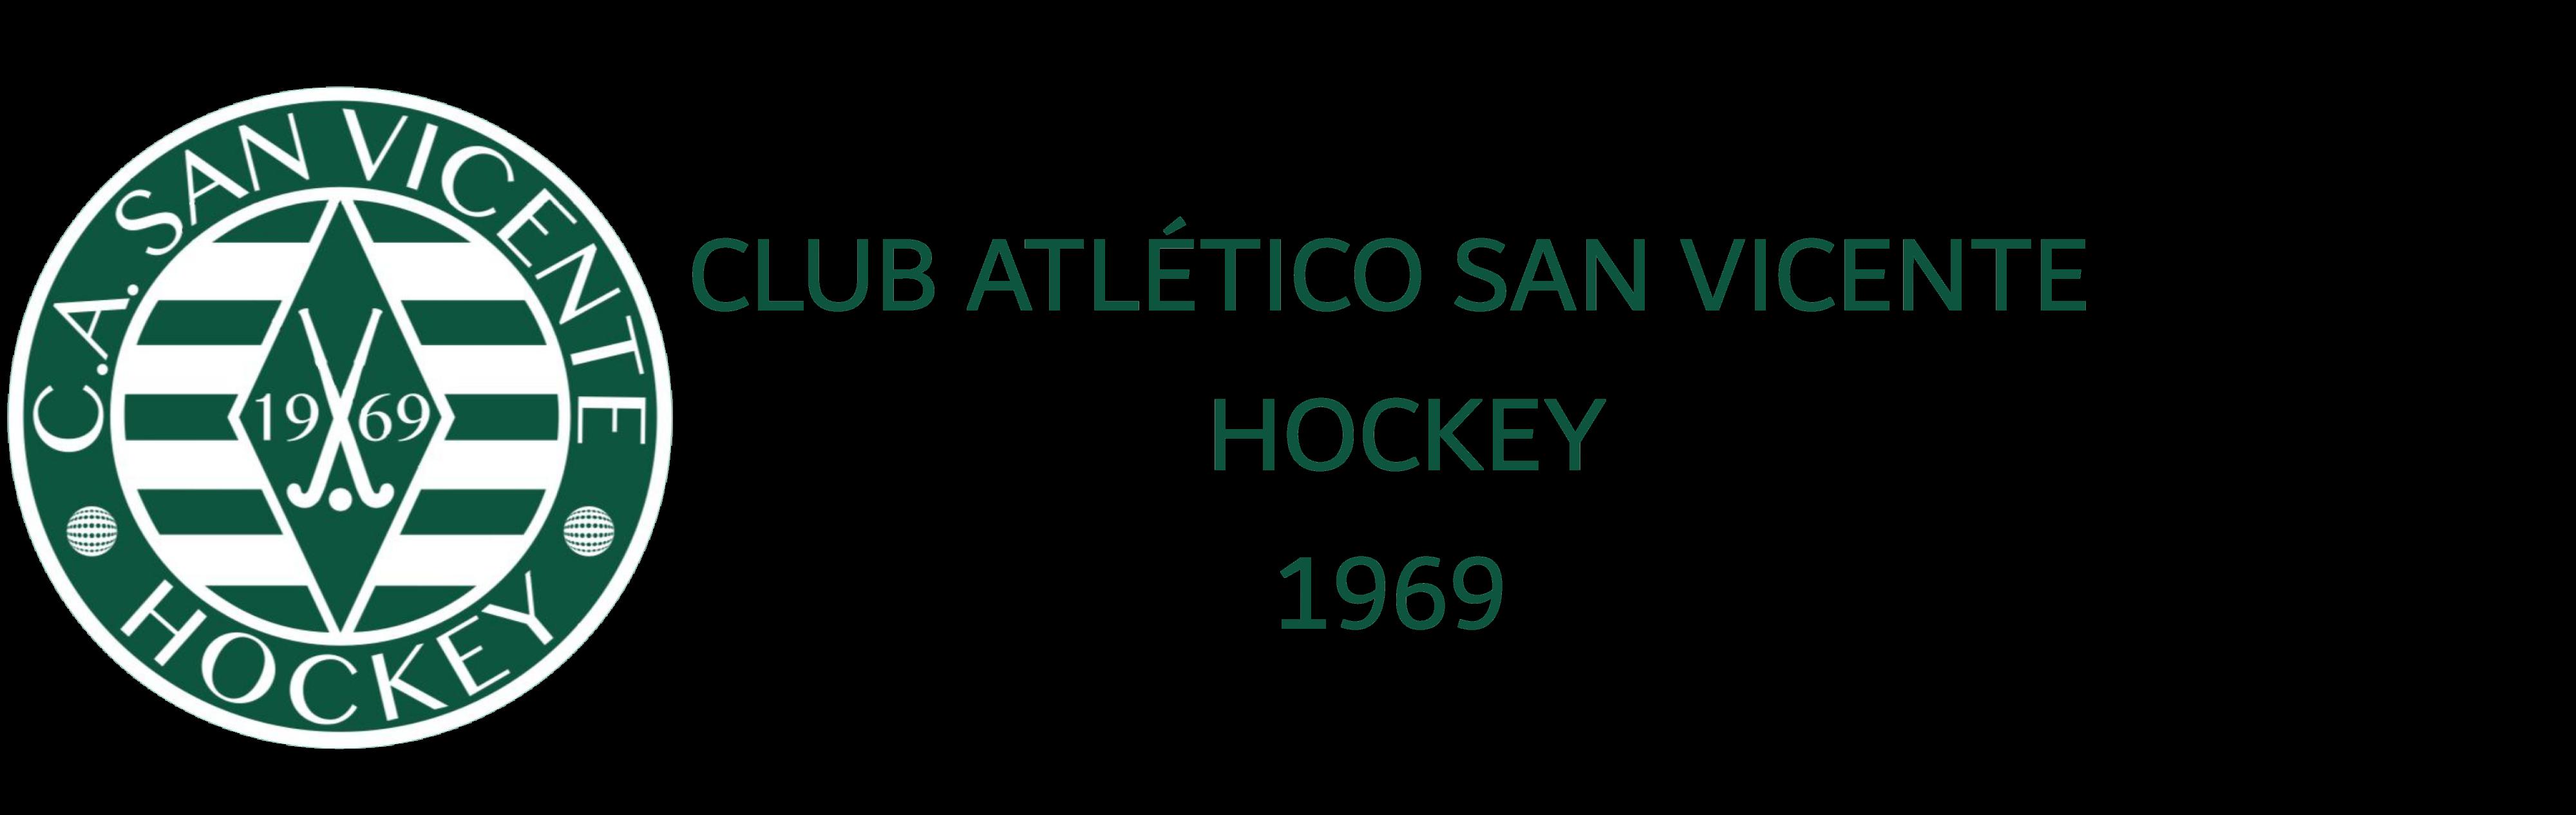 Club Atlético San Vicente - UA